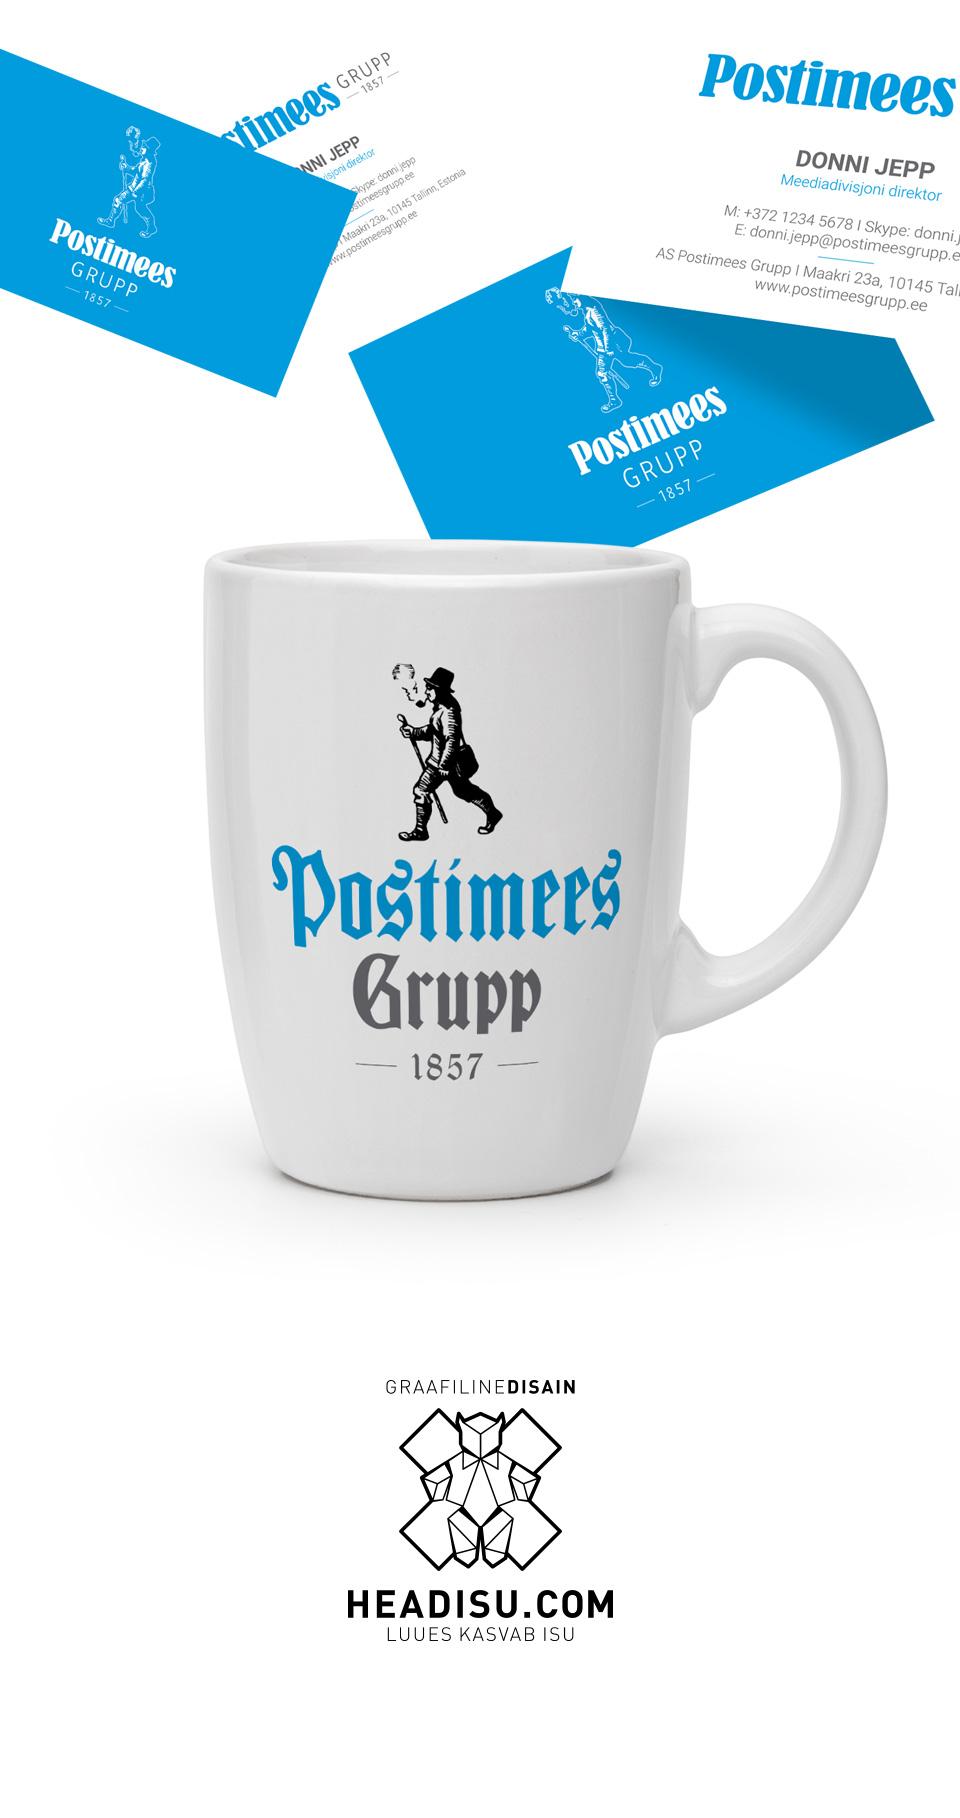 PostimeesGrupp-CVI-5